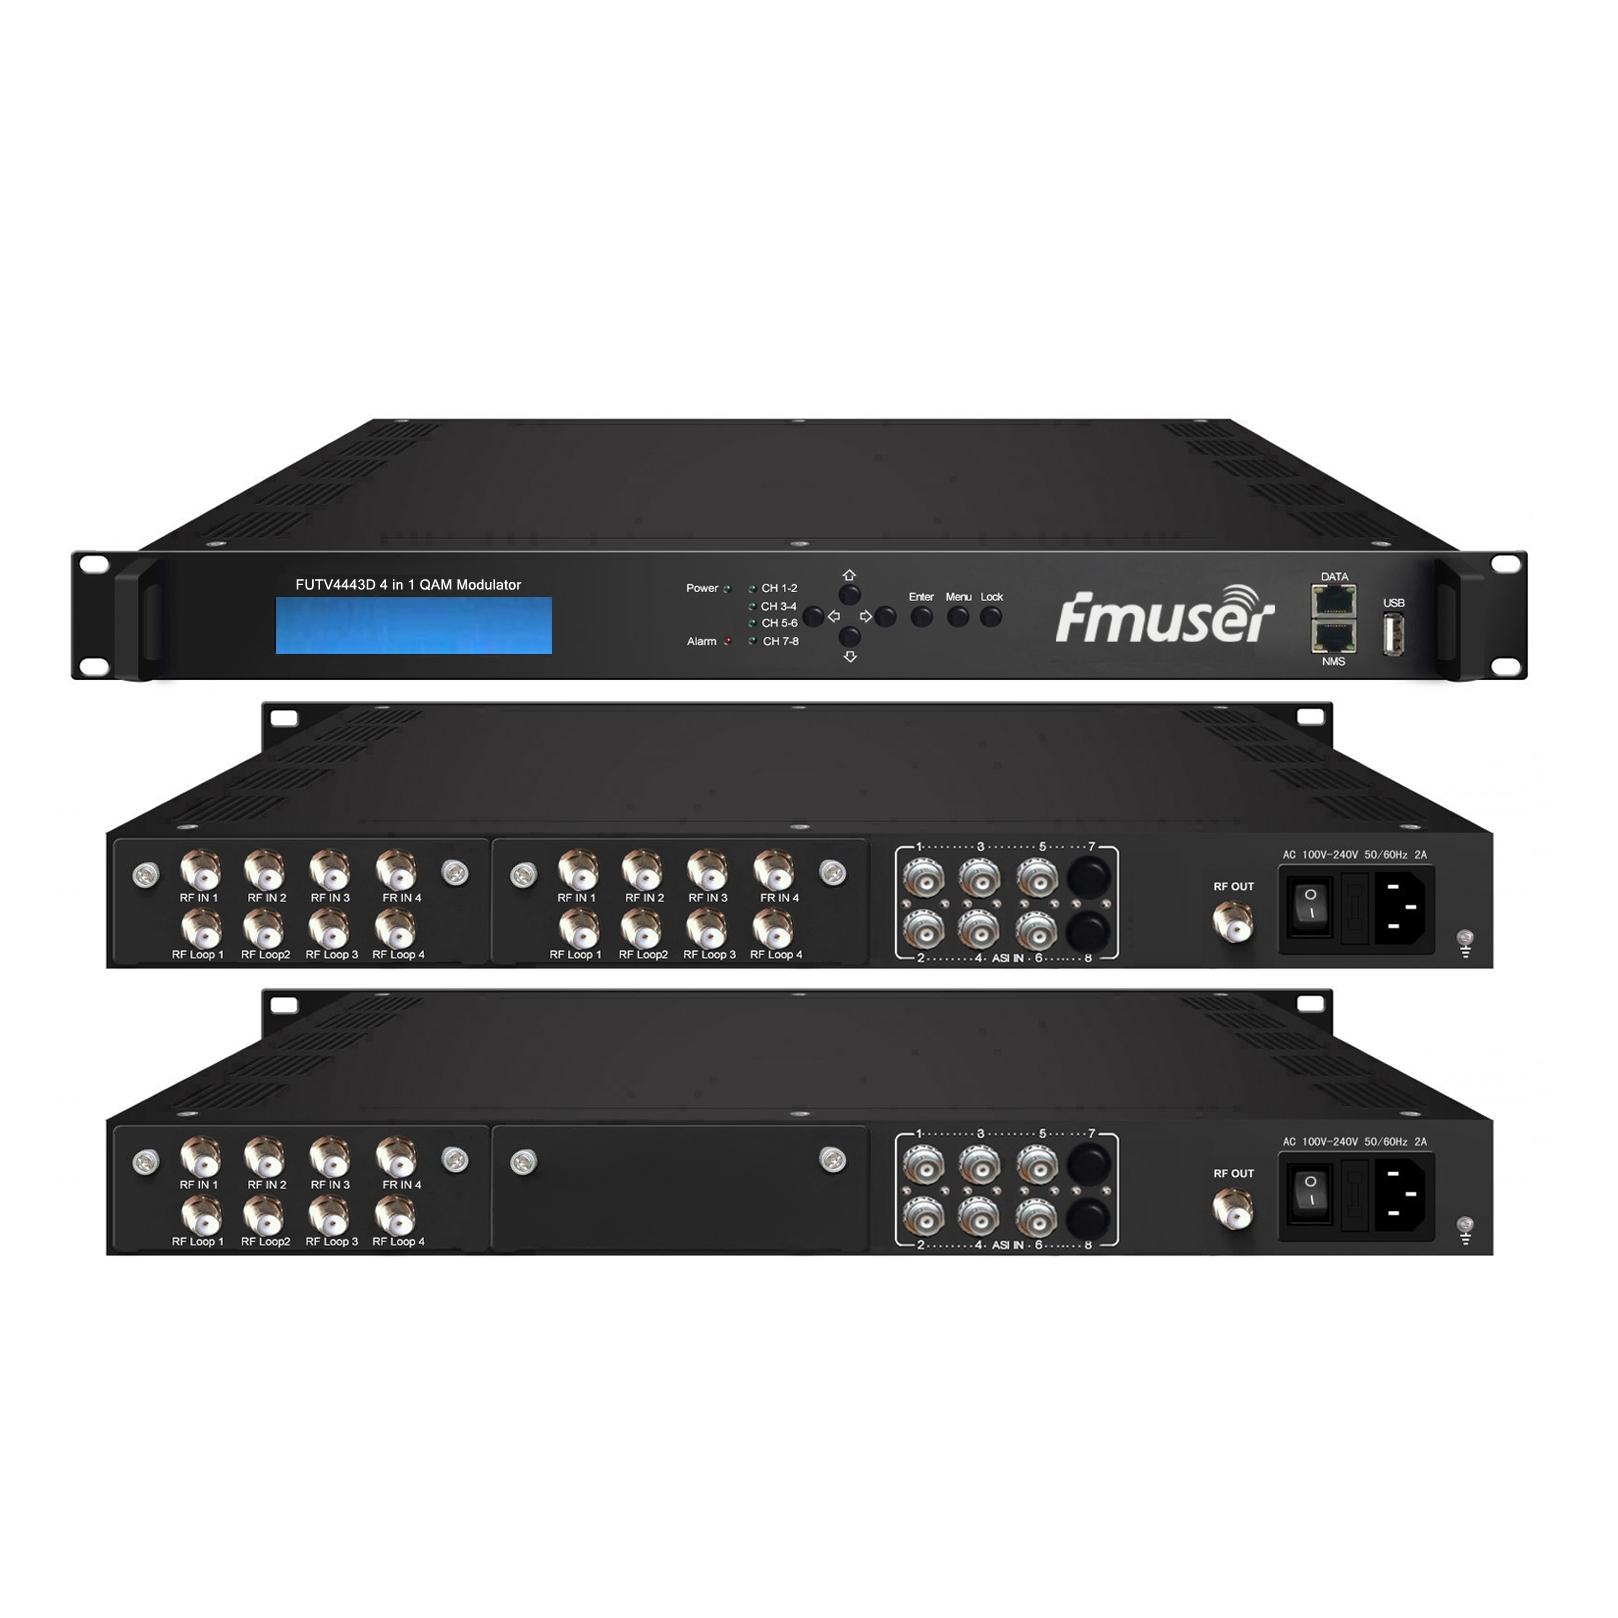 FMUSER FUTV4443D 4 в 1 Mux-Scrambling QAM модулятор (8Tuner + 6 * ASI в, 4Tuner + 6 * ASI + 2 * IP-выход) с веб-managementtor